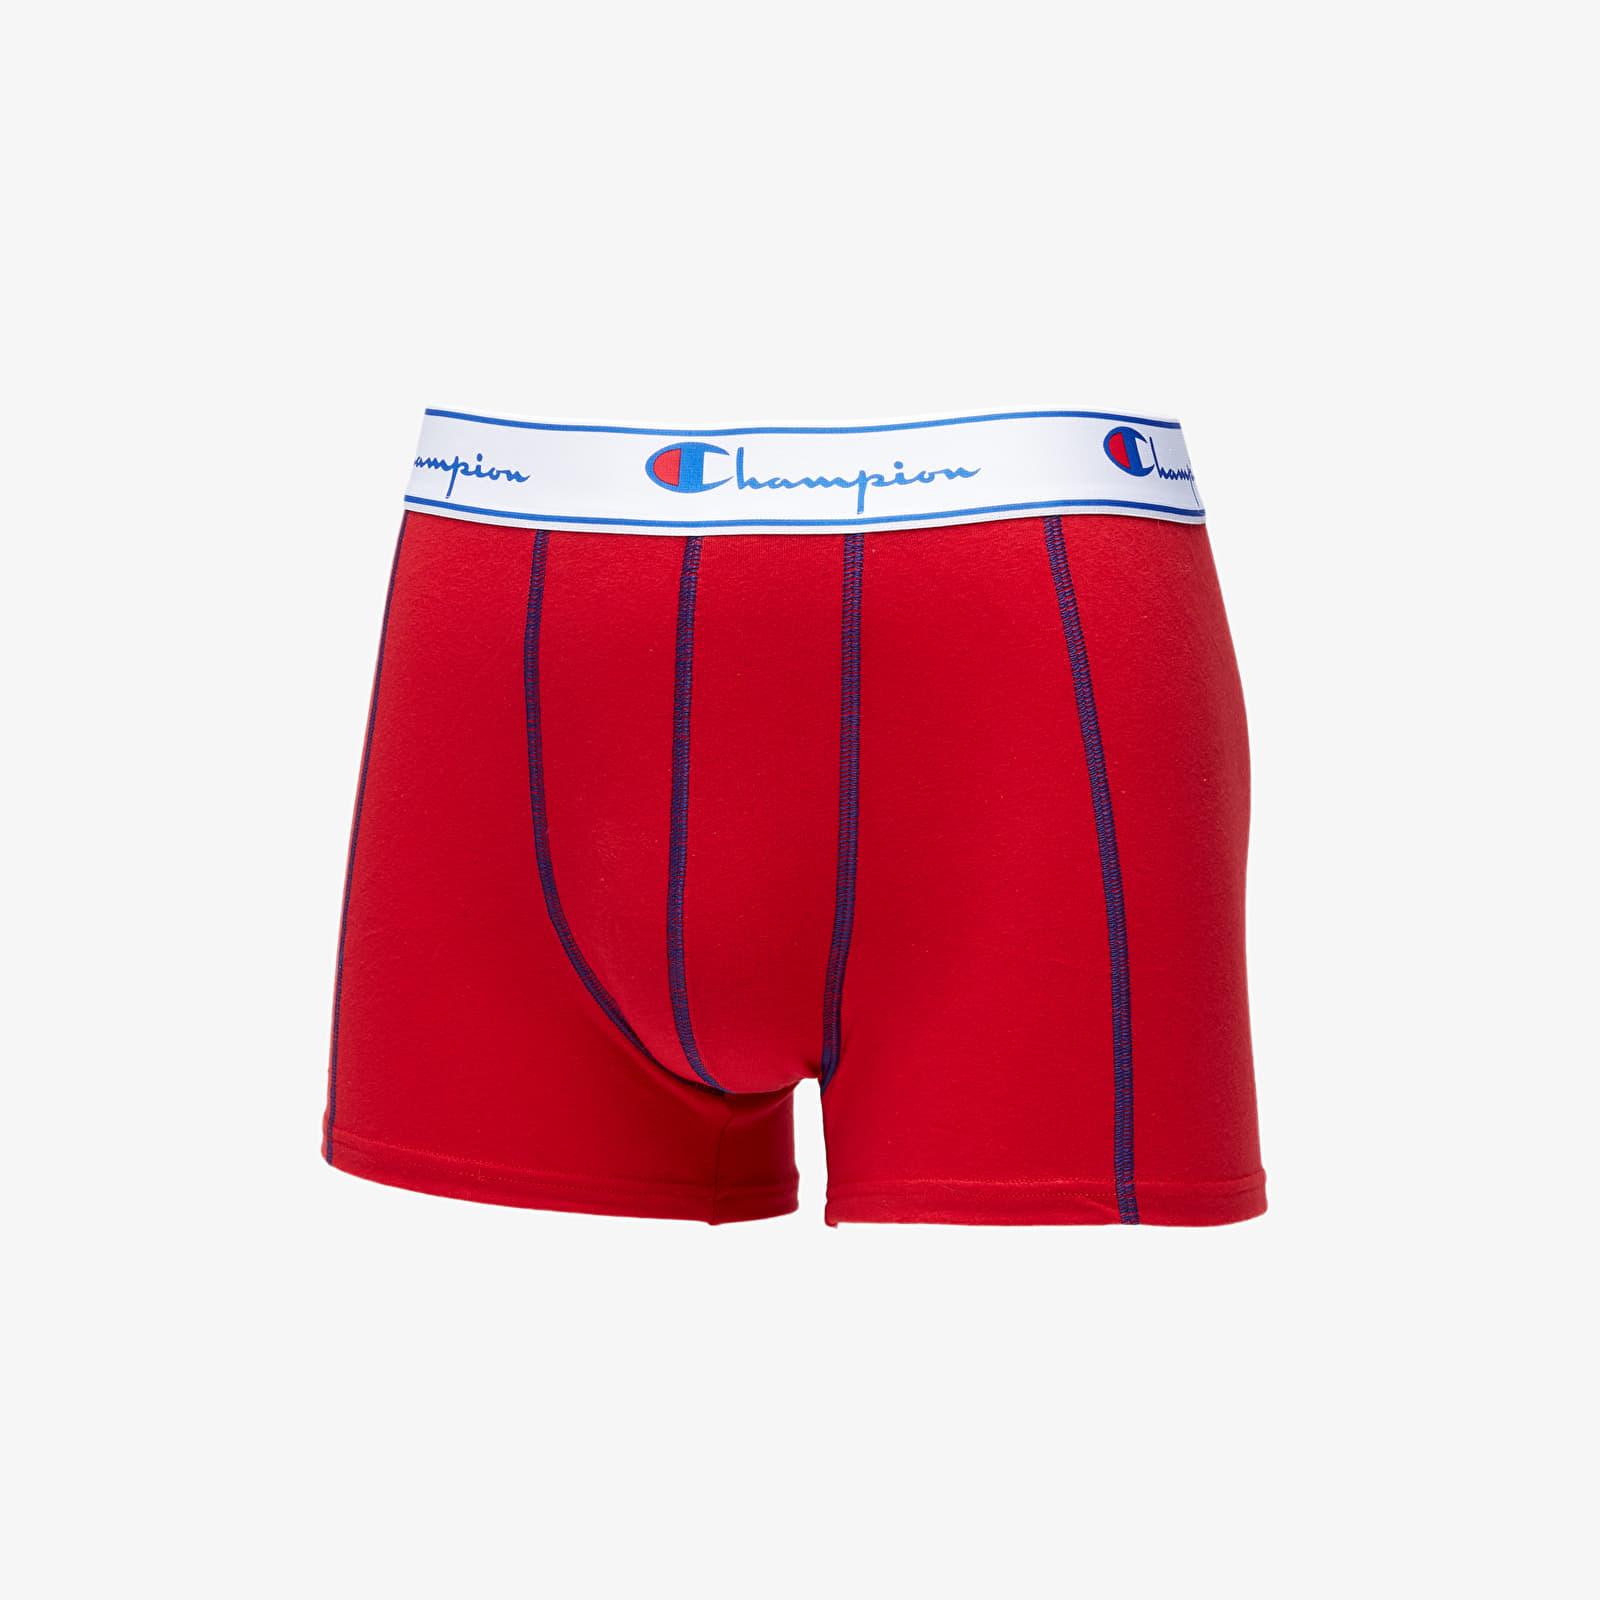 Men's underwear Champion 2Pack Boxers Multicolor